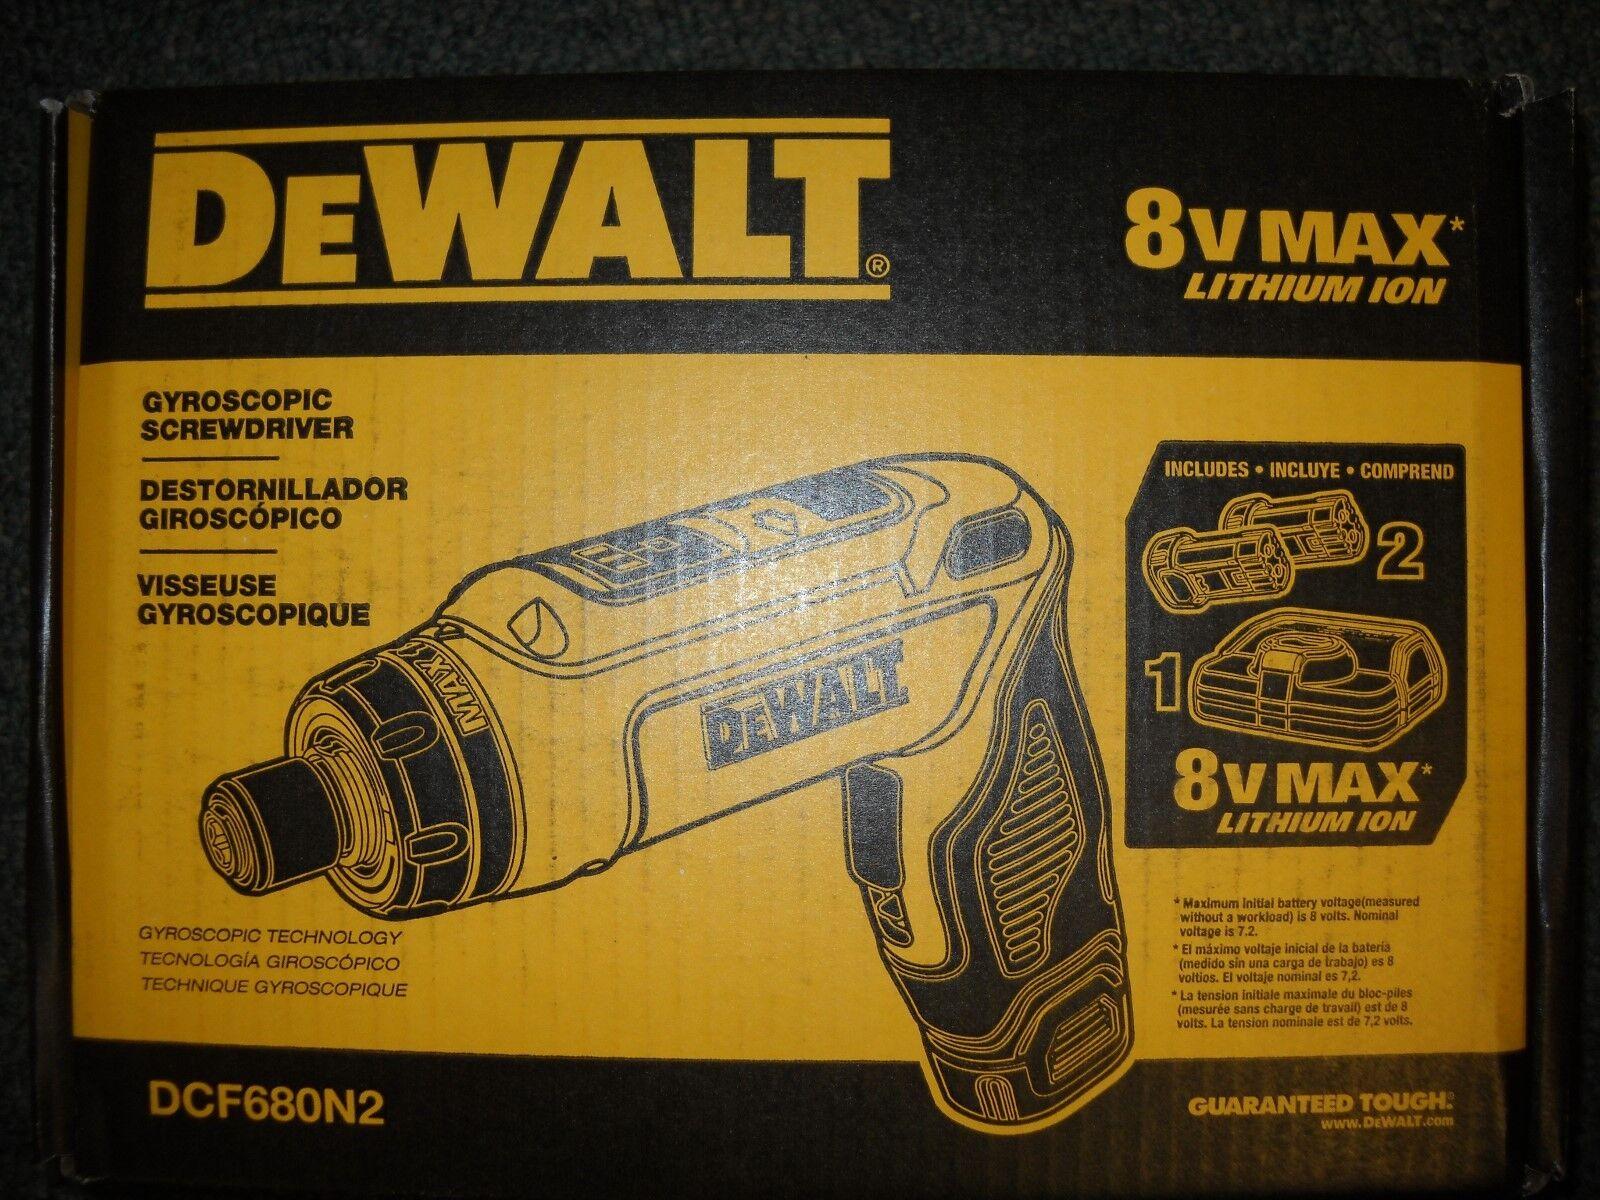 DEWALT DCF680N2 8V MAX Gyroscopic Screwdriver w  2 Li-Ion Batteries New